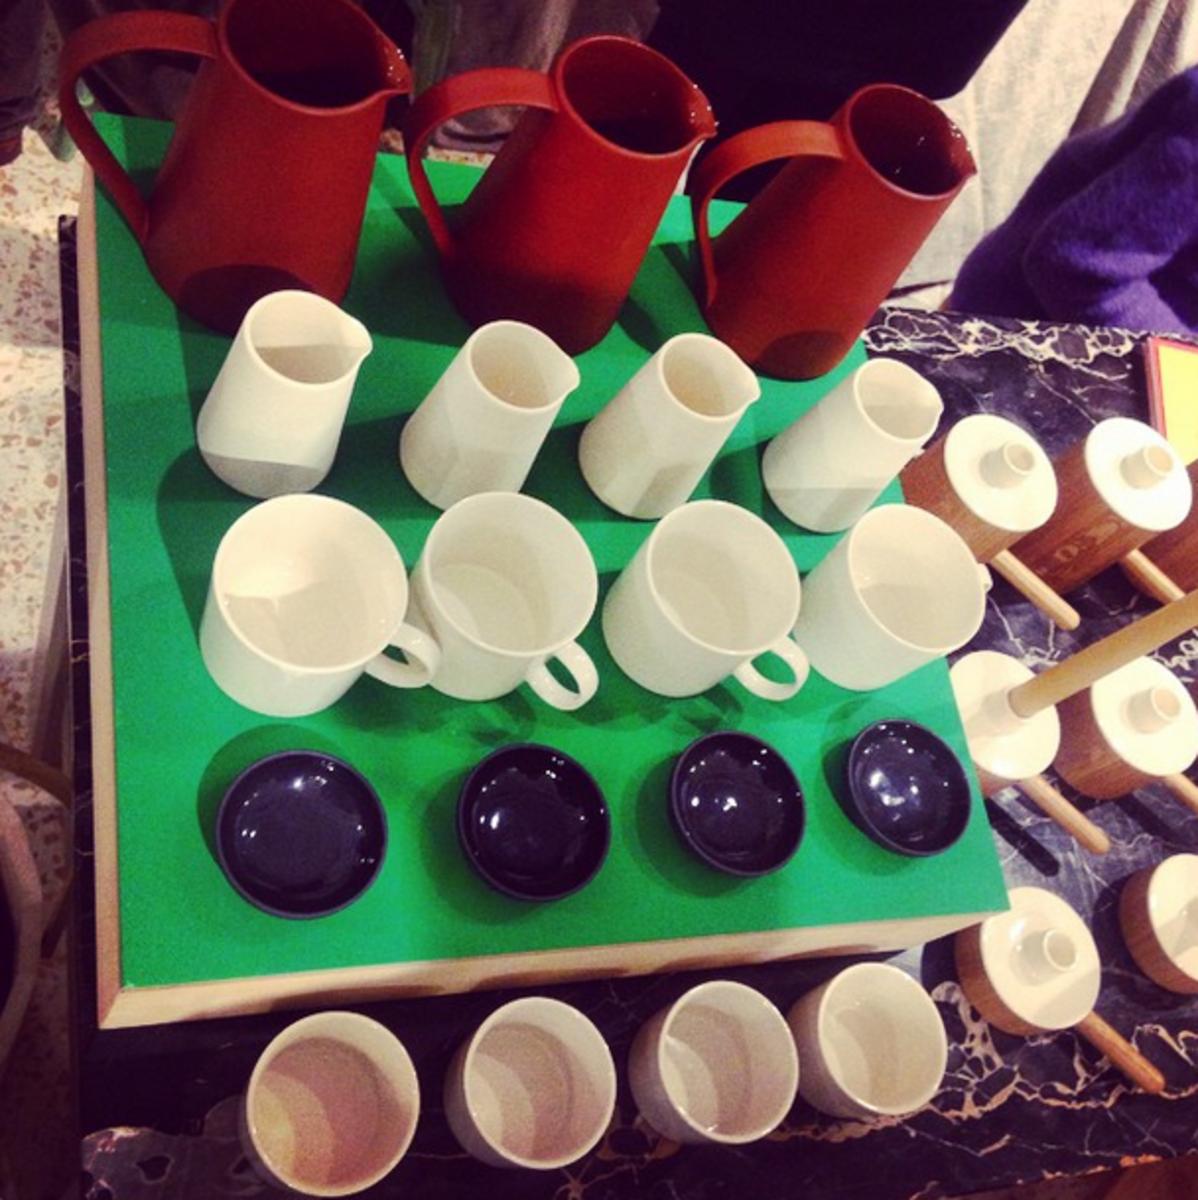 Artisan Pottery at Remodelista Market London 2014